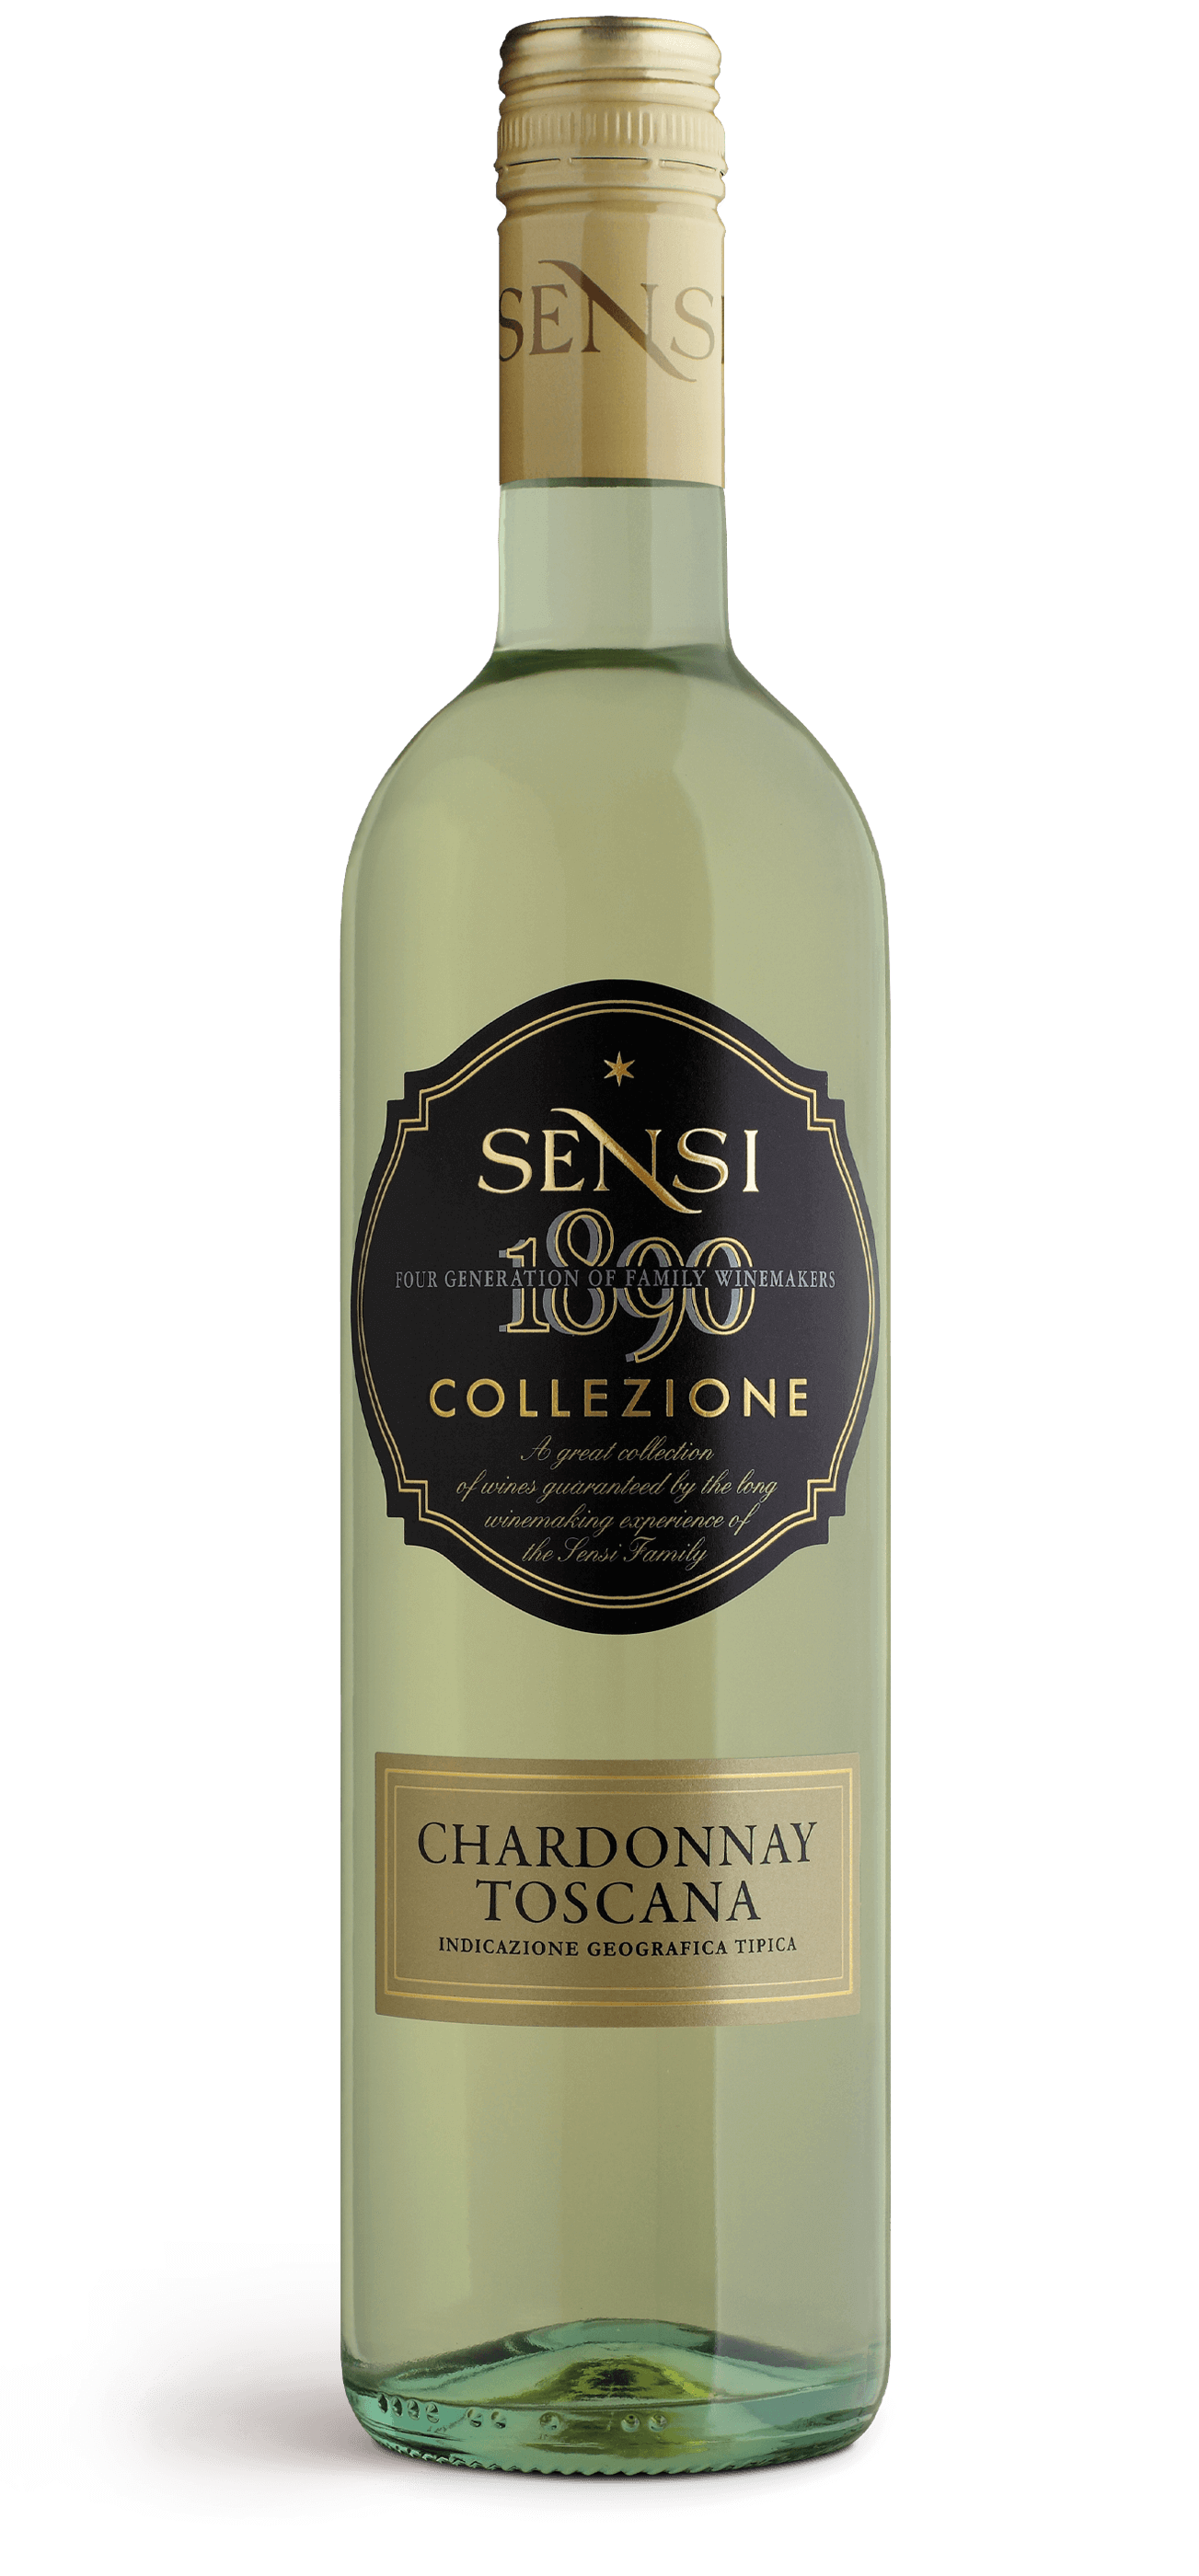 Sensi Collezione Toscana Chardonnay